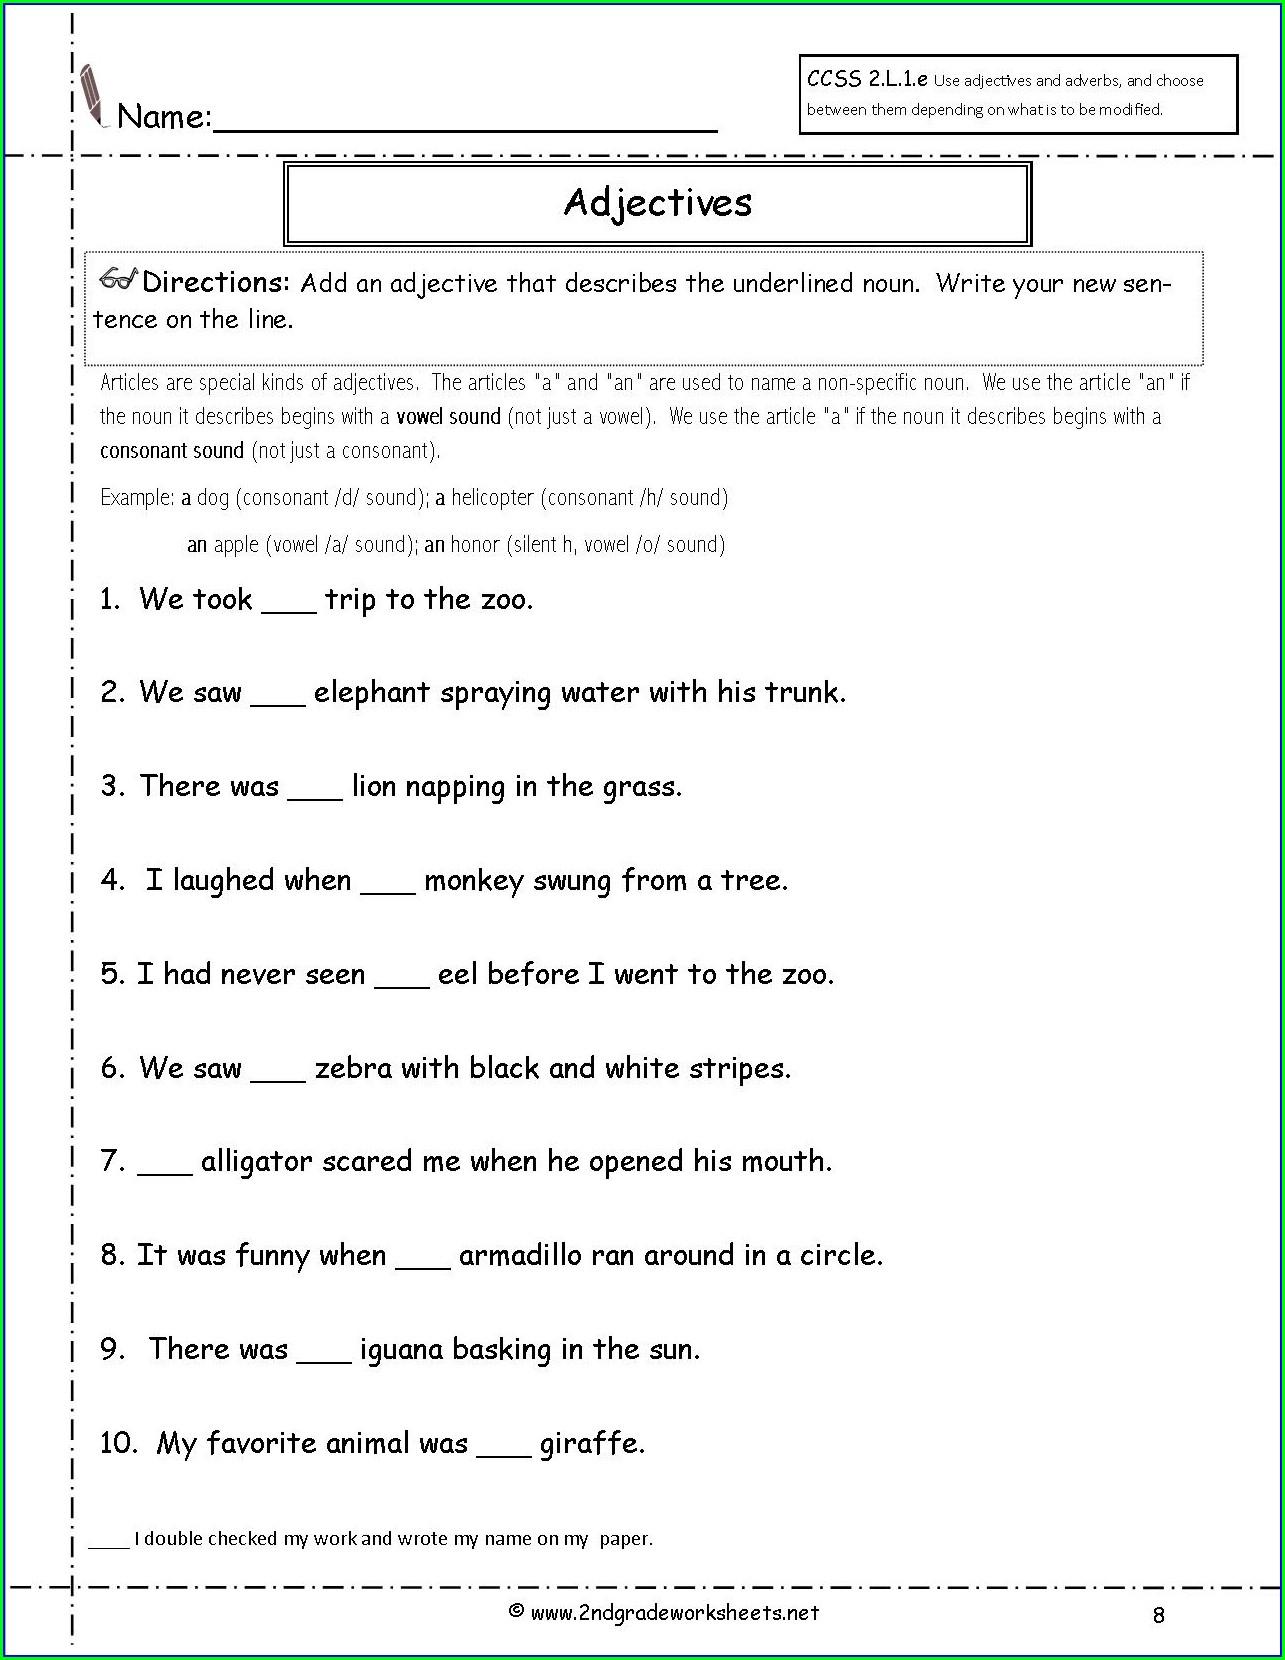 Grade 3 Time Worksheet For Class 3 Worksheet Resume Examples